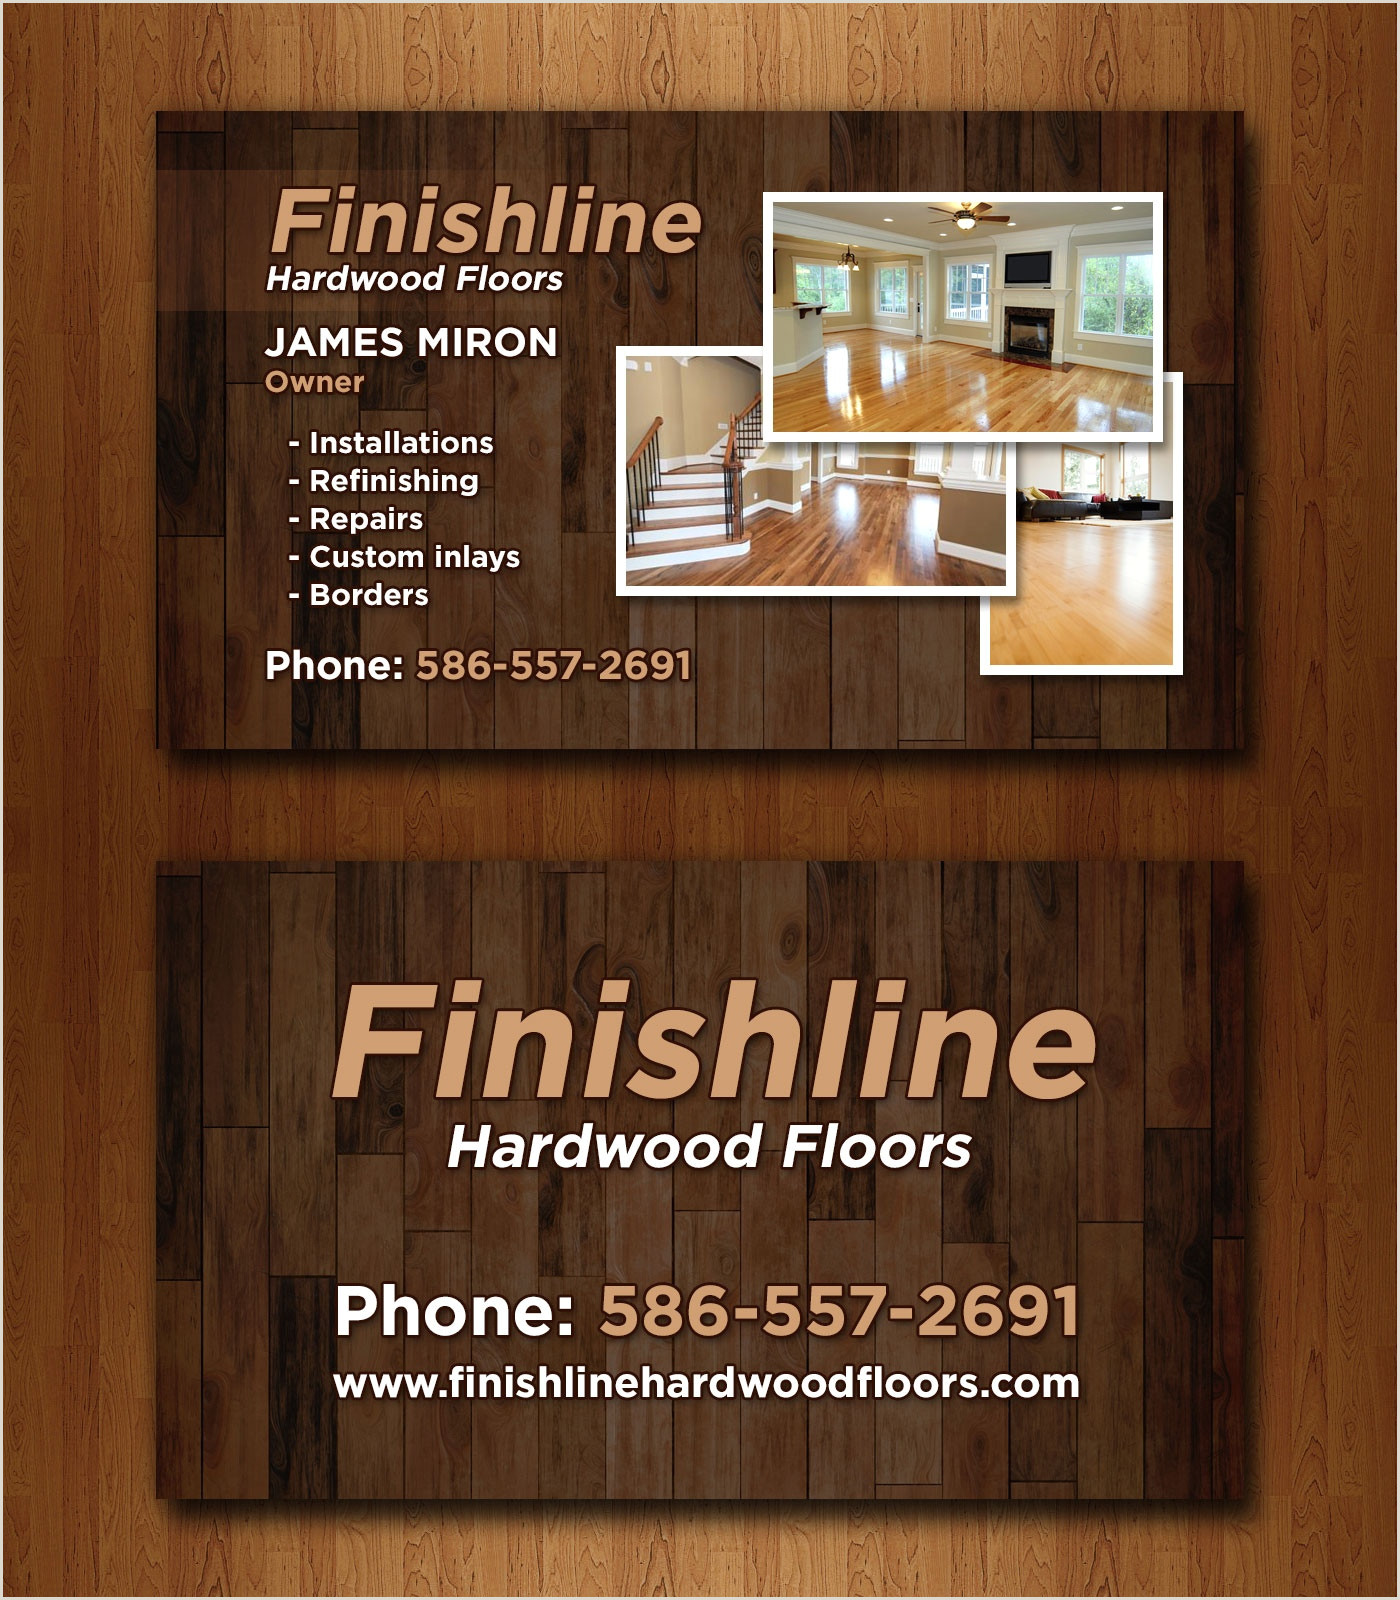 Classic Business Cards 14 Popular Hardwood Flooring Business Card Template